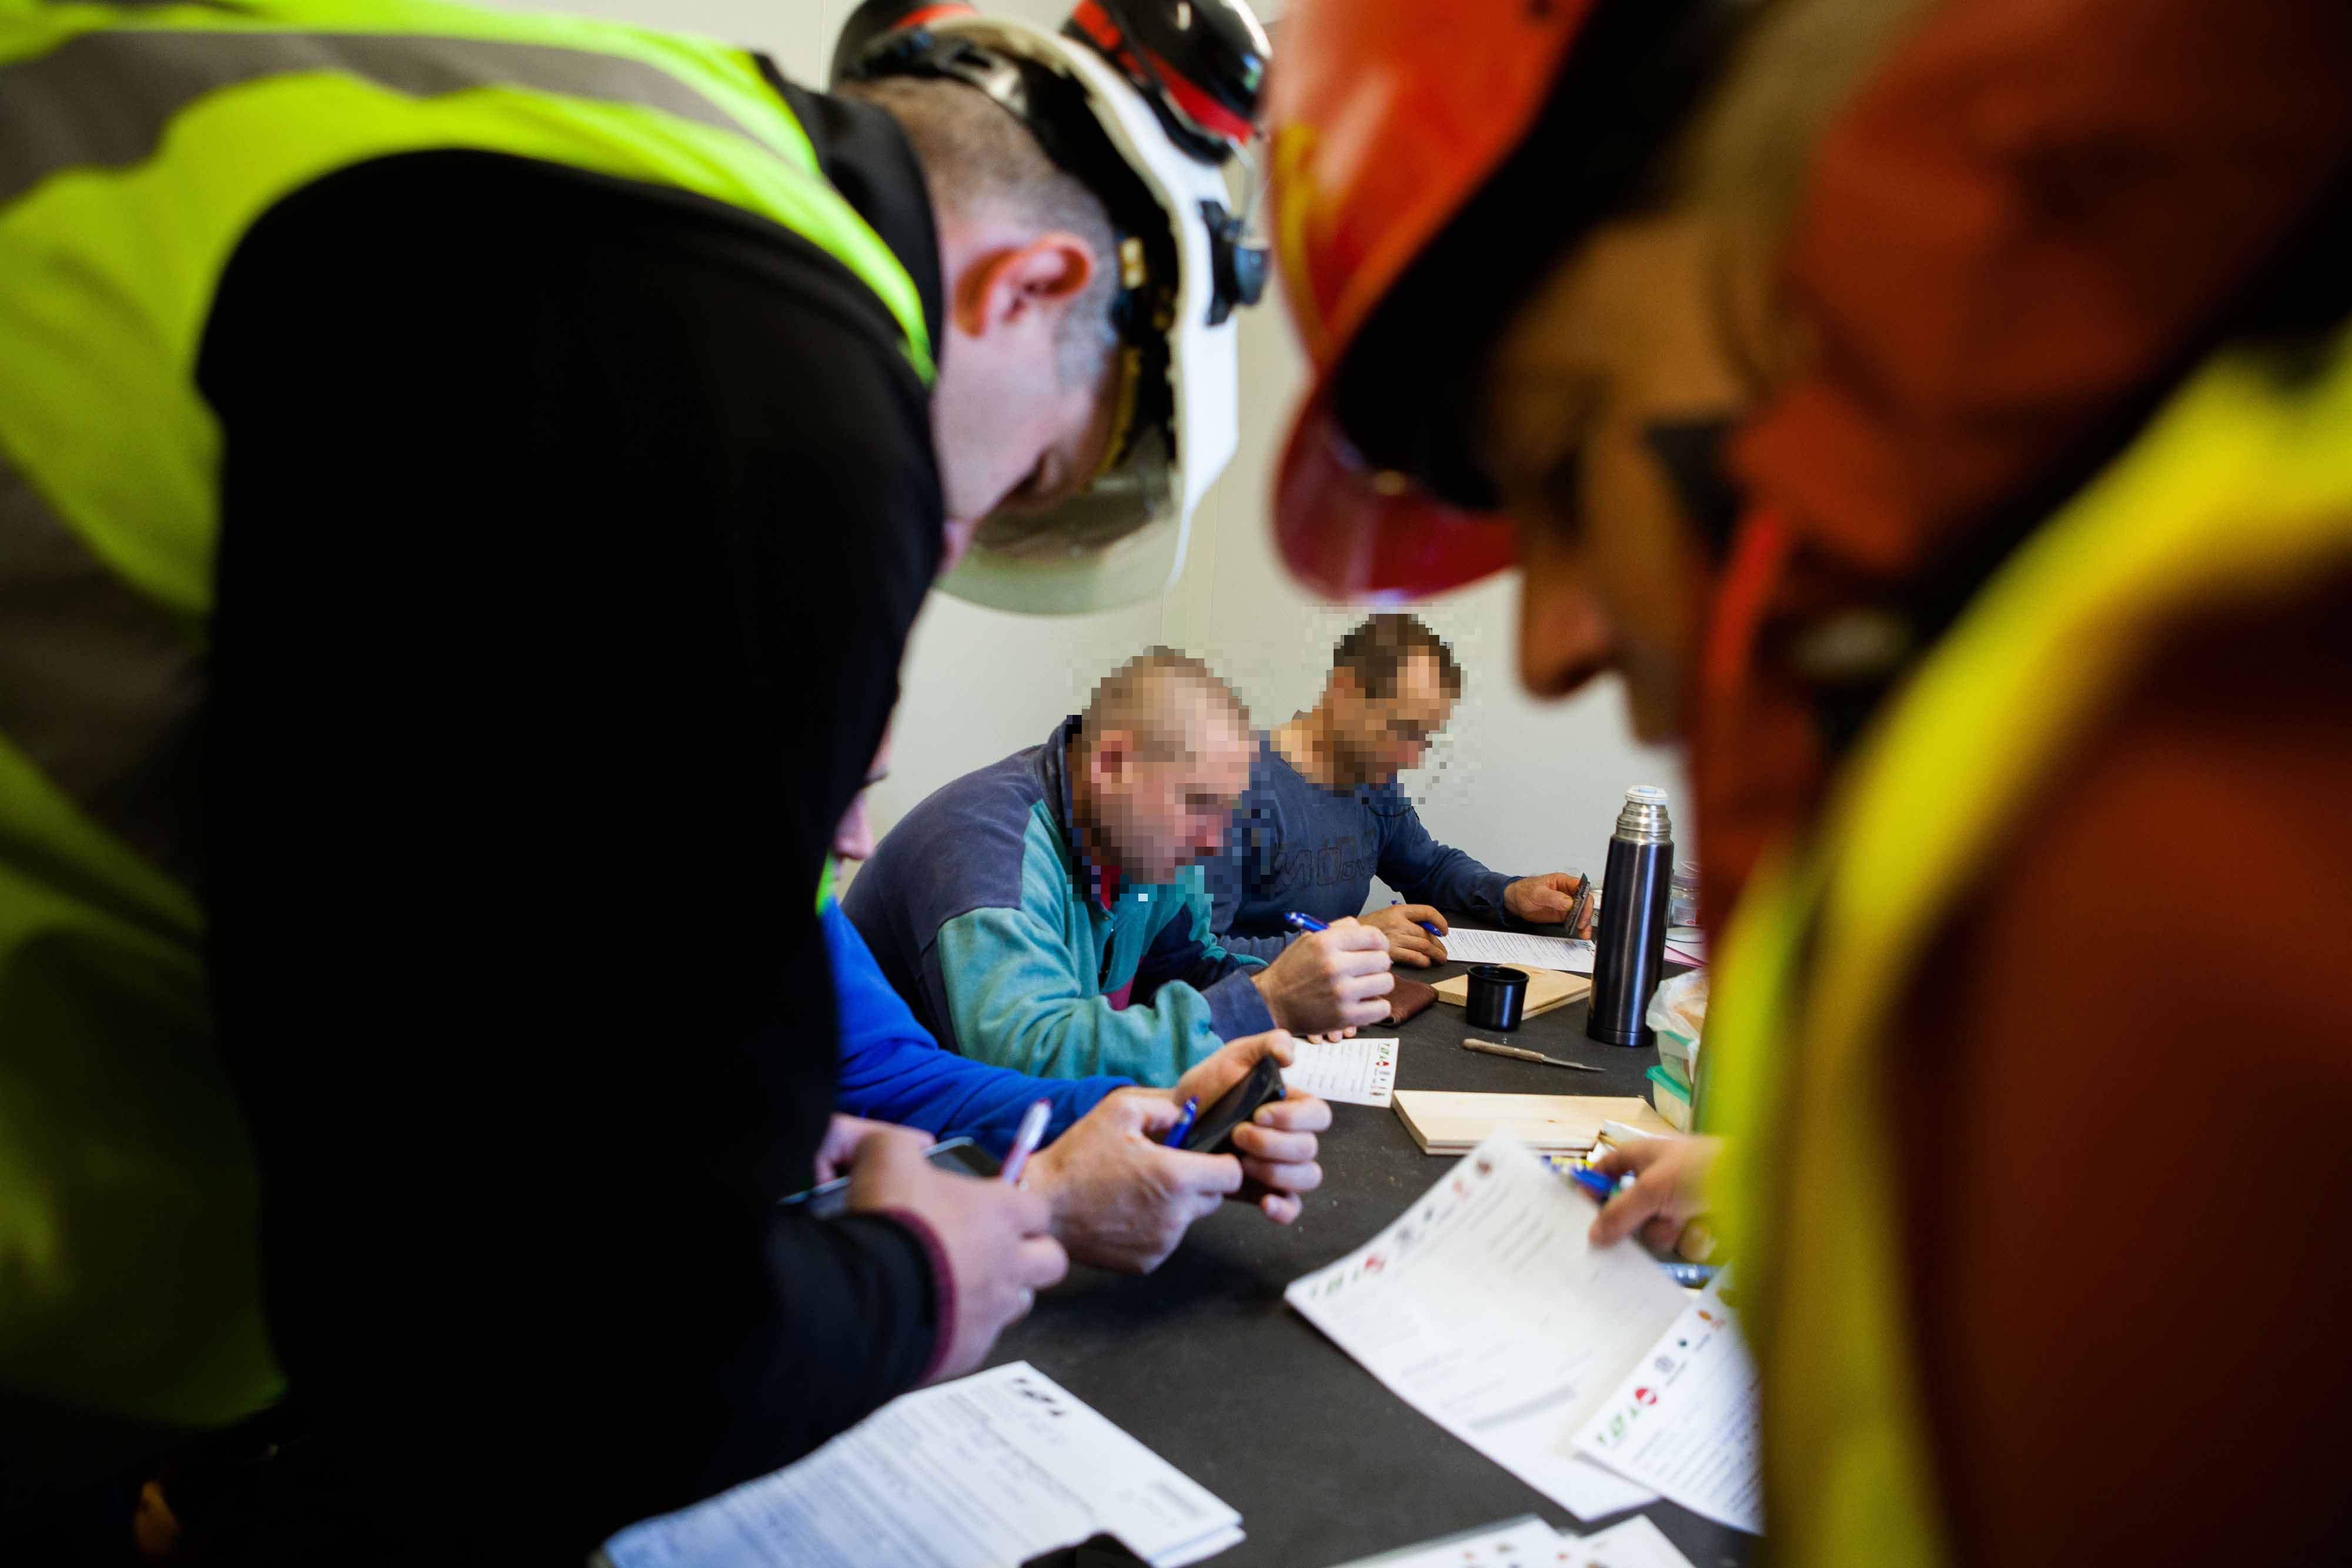 Svart ekonomi - nordiska strategier mot arbetslivskriminalitet